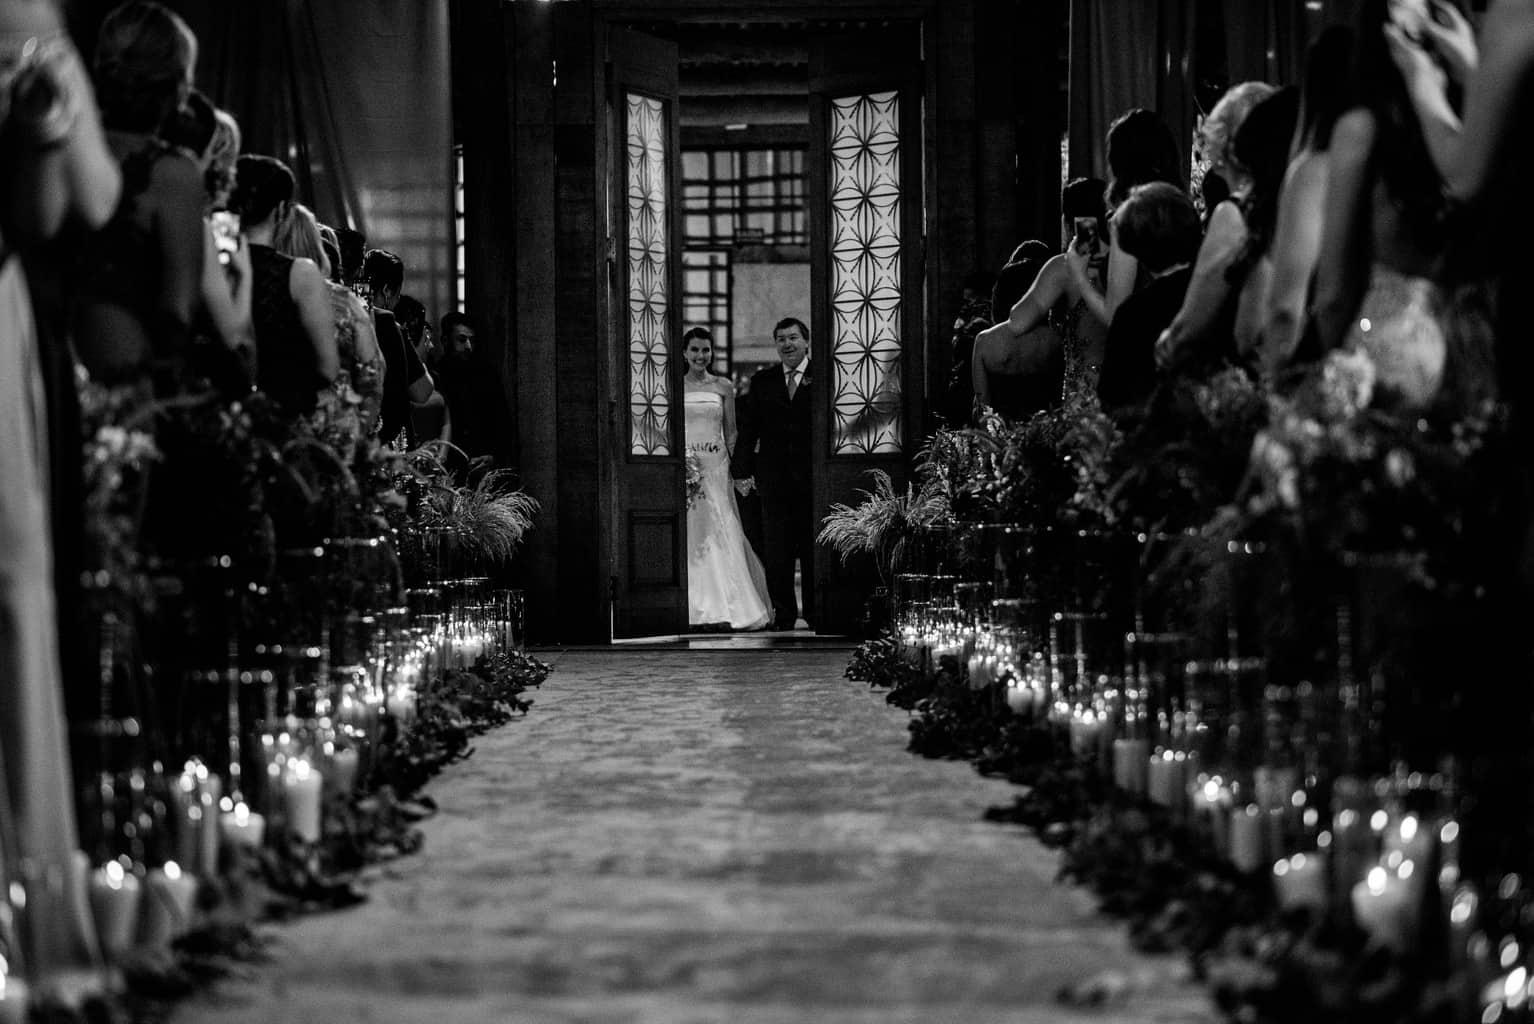 Bel-Benkler-eventos-Casamento-Ariane-e-Matheus-cerimonia-decoracao-contemporanea-fotografia-Rafael-Bigarelli-noivos-na-pista-Spazio-Giardini-49